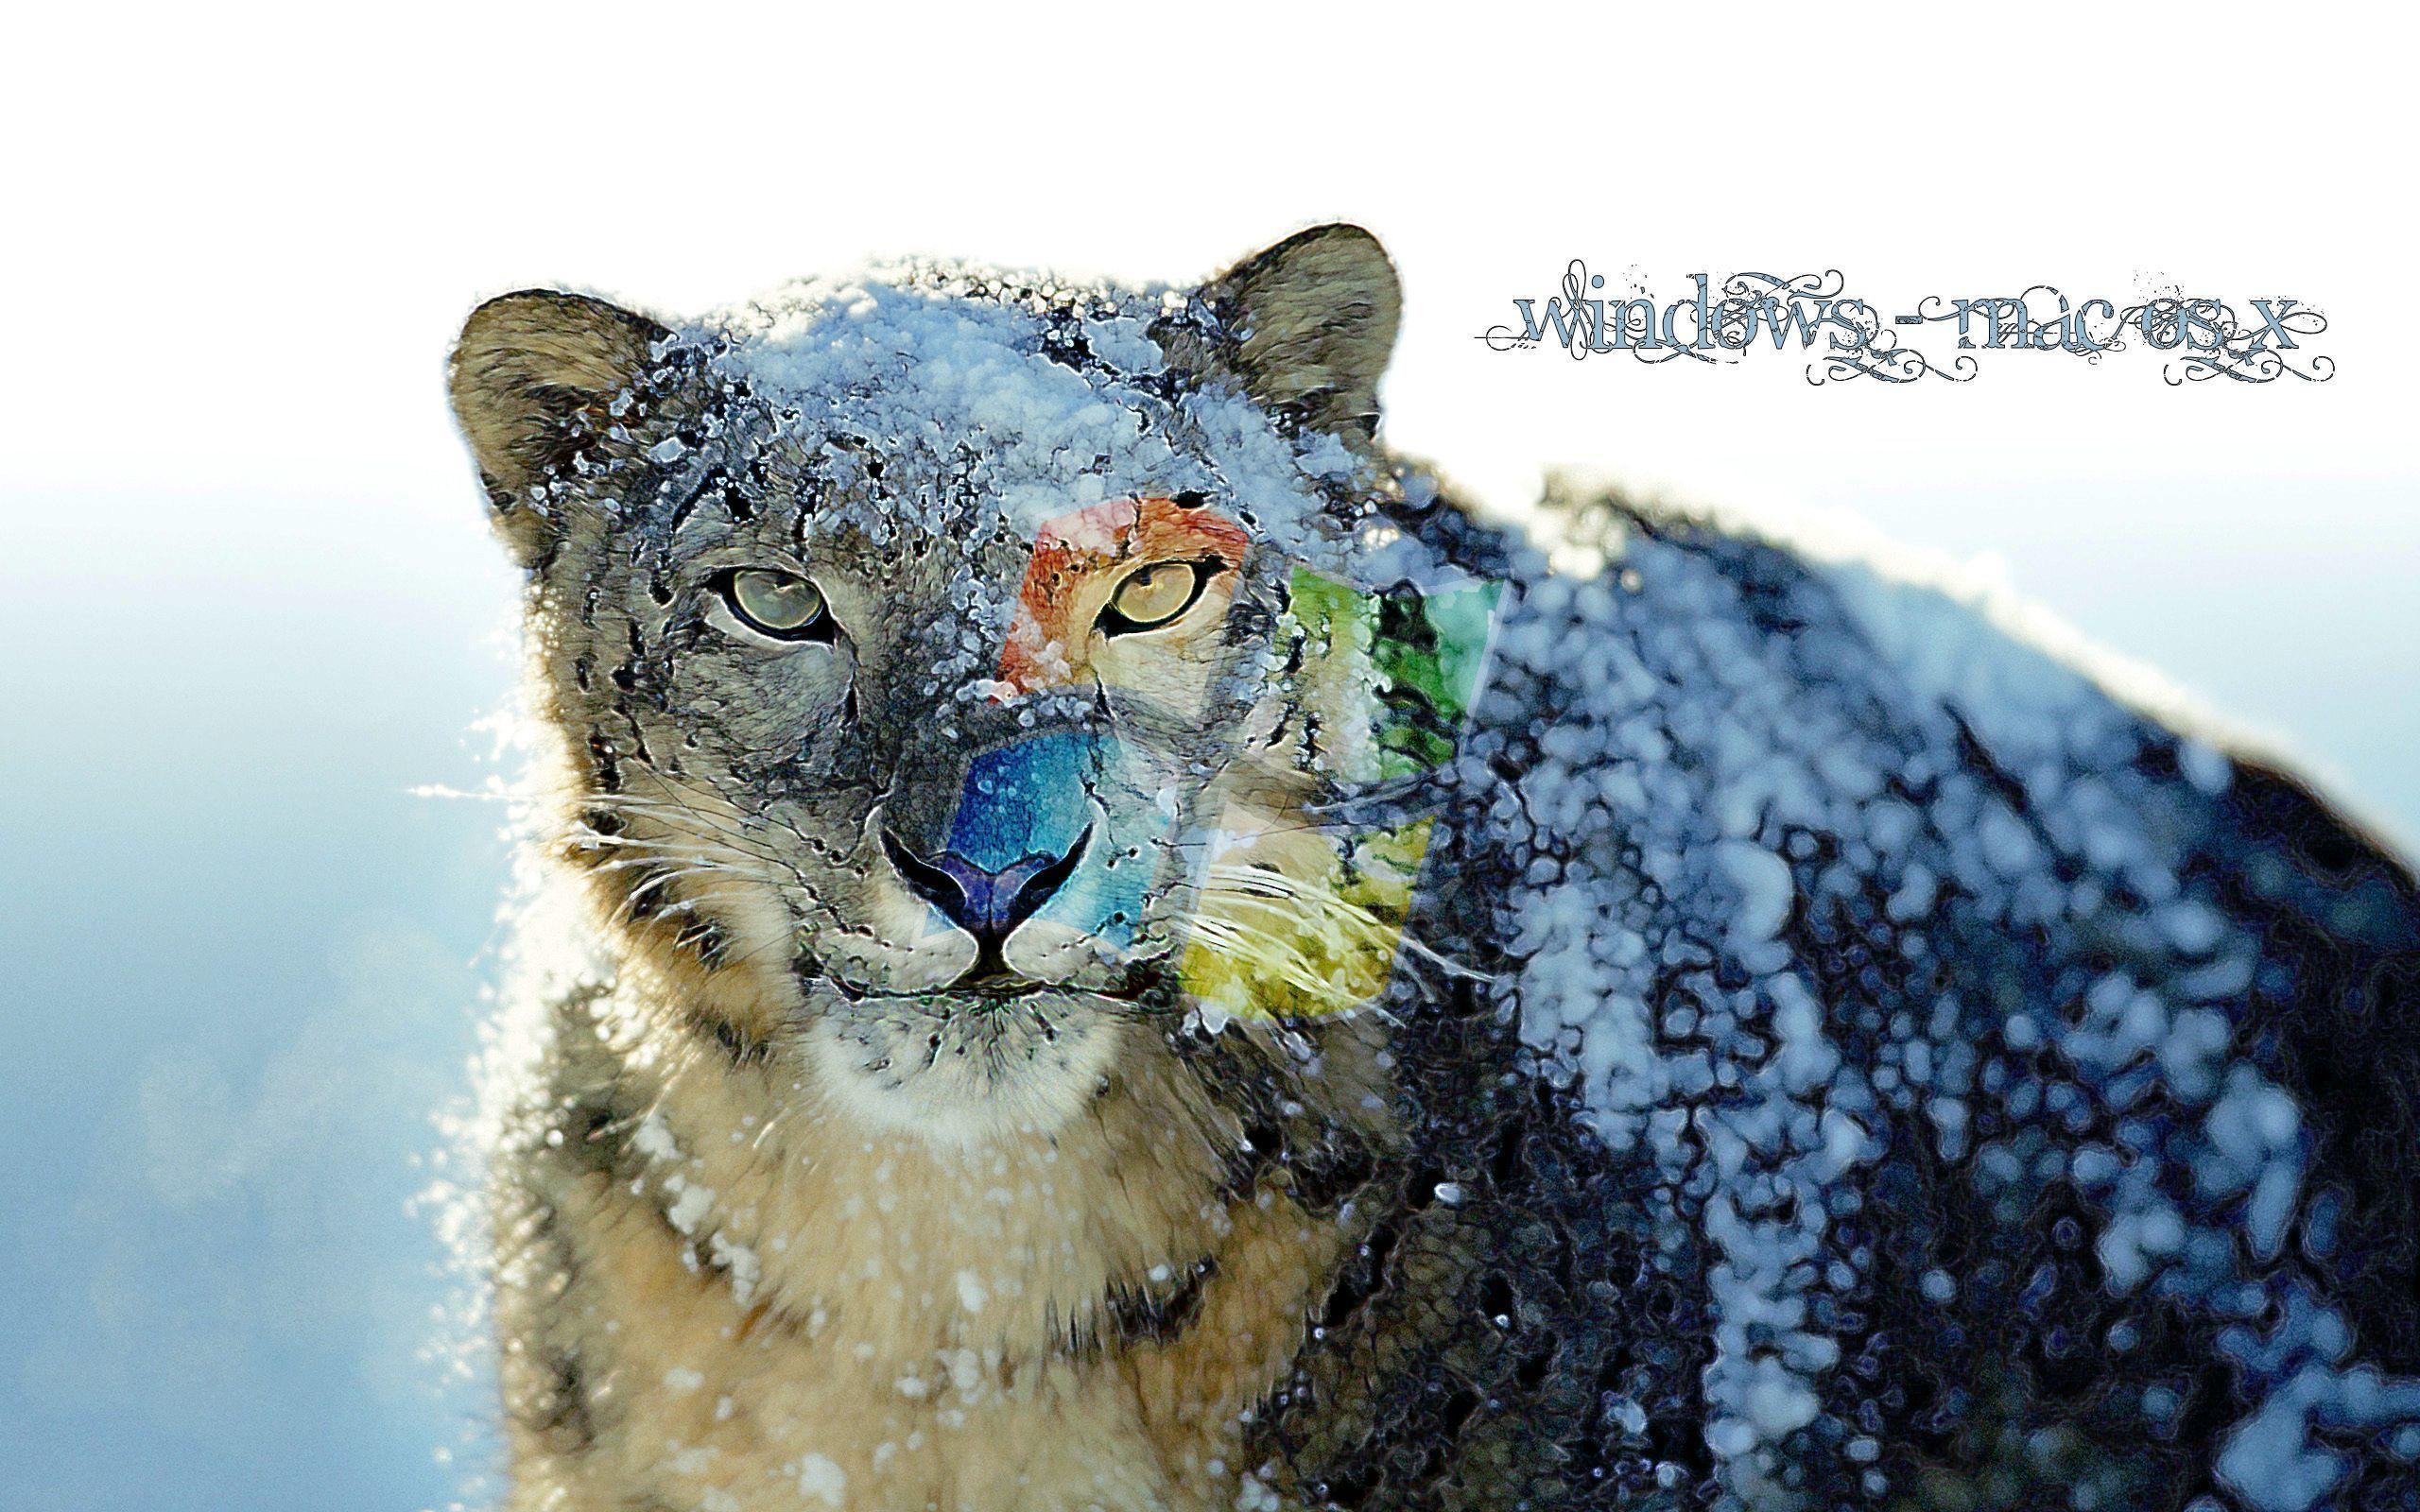 snow leopard backgrounds - wallpaper cave